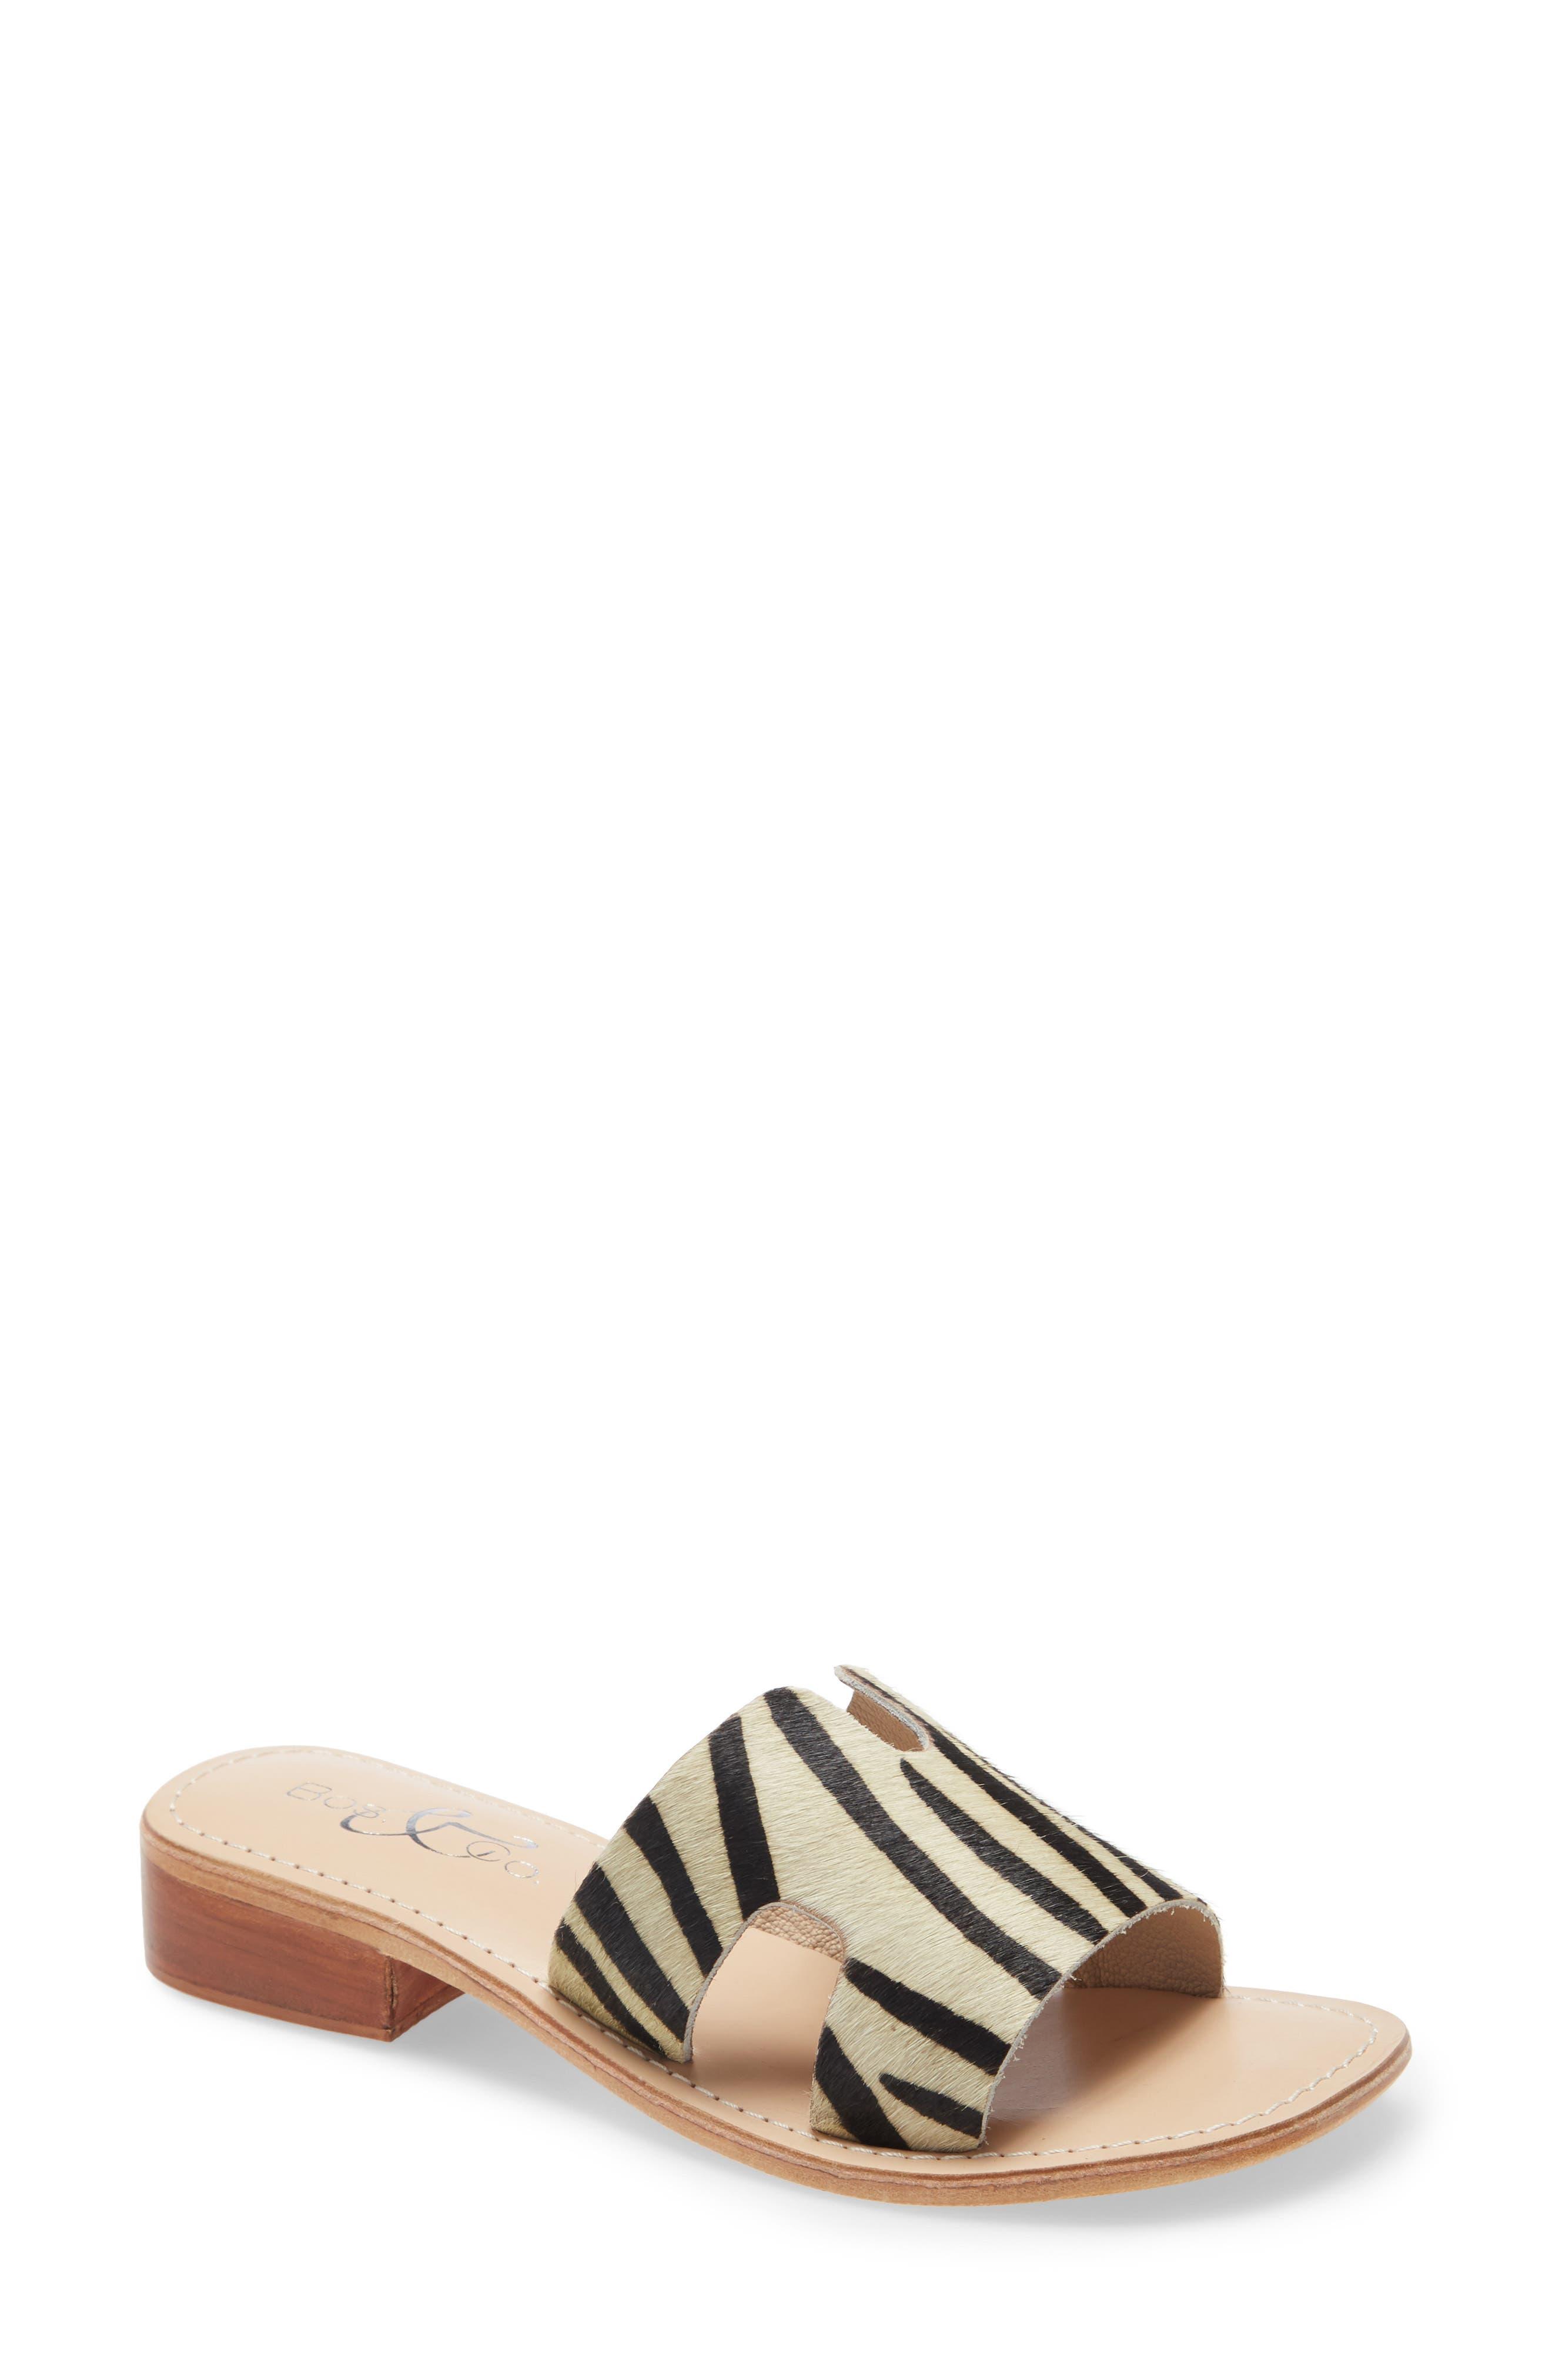 Imani Genuine Calf Hair Slide Sandal